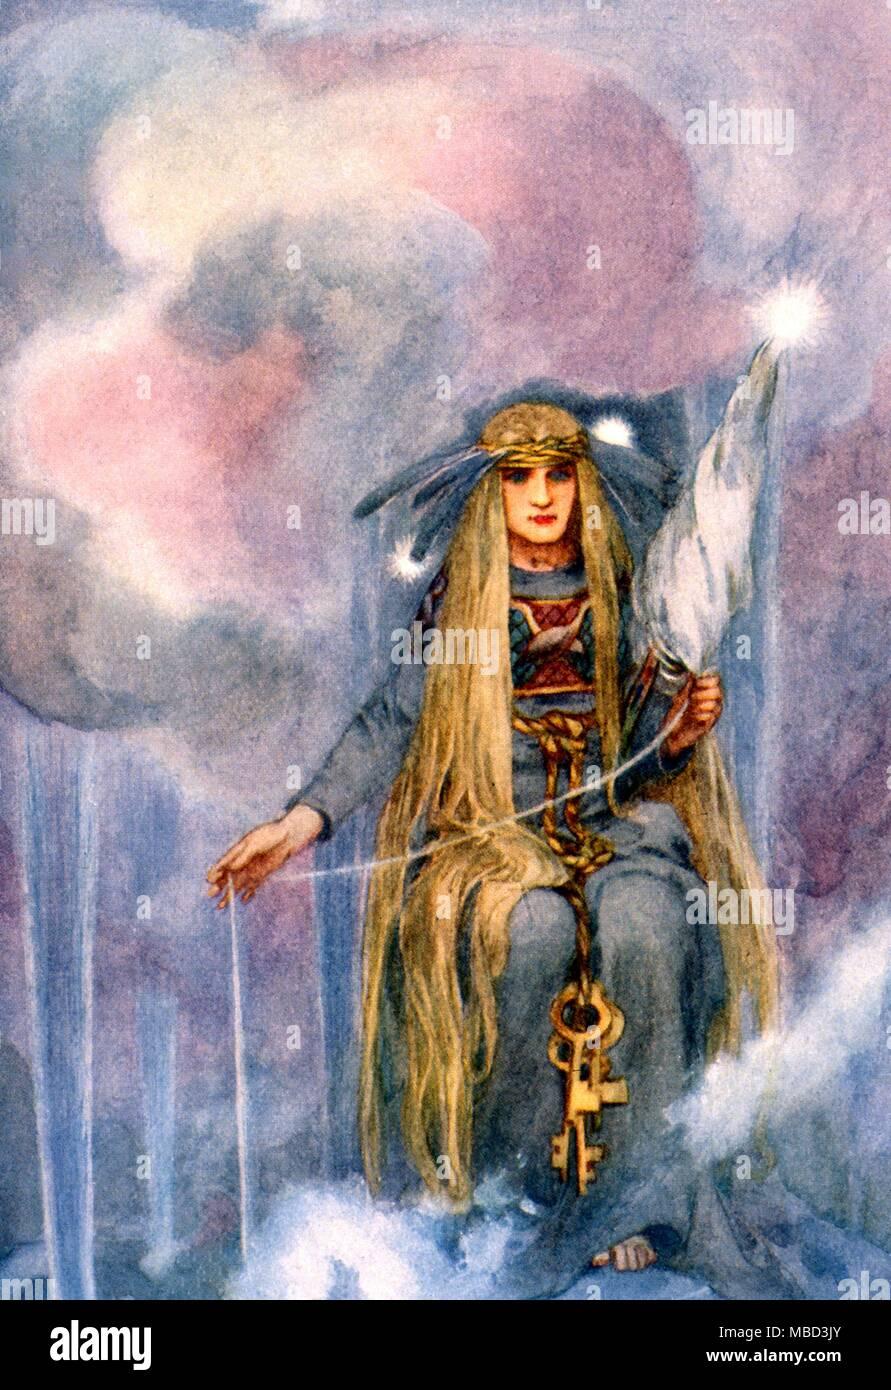 Norse Mythology The Goddess Freya Wife Of Odin The